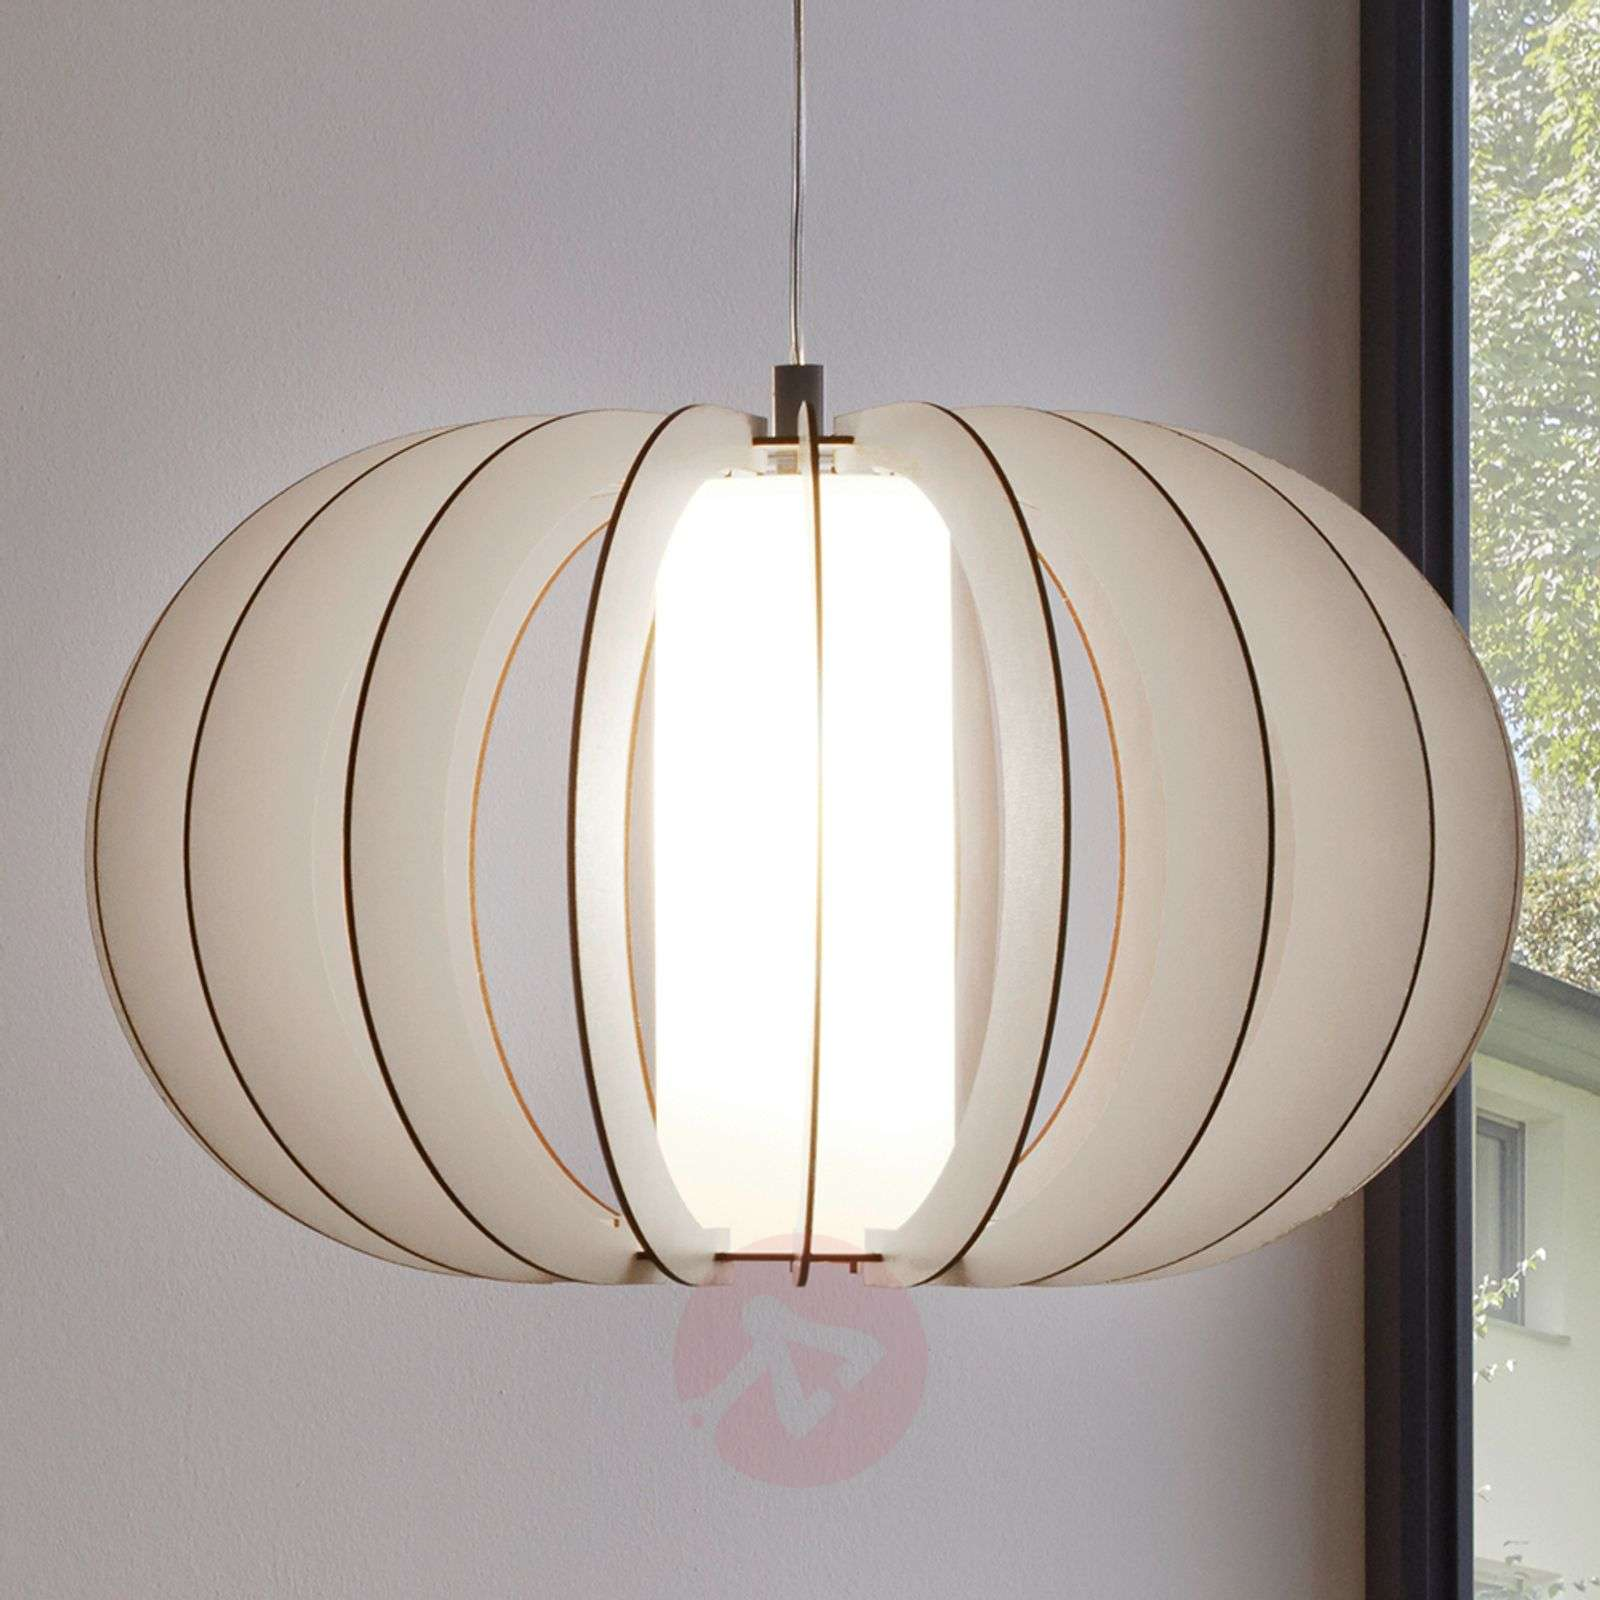 White hanging light Stellato with wood slat shade-3031891X-01